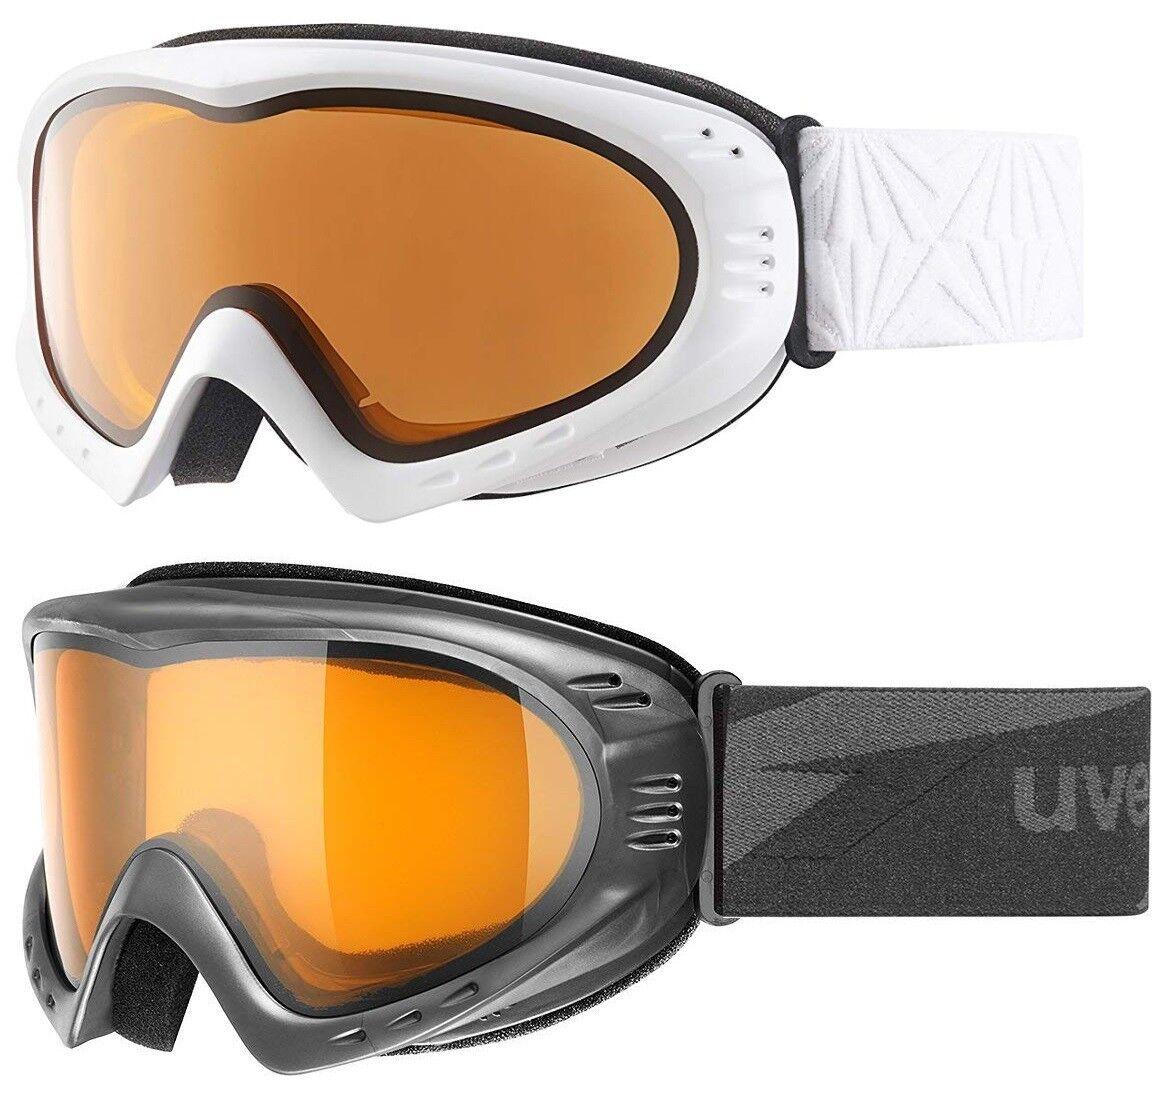 Uvex Cevron Lgl Ski Goggles Snowboard Goggles Collection 2019 New